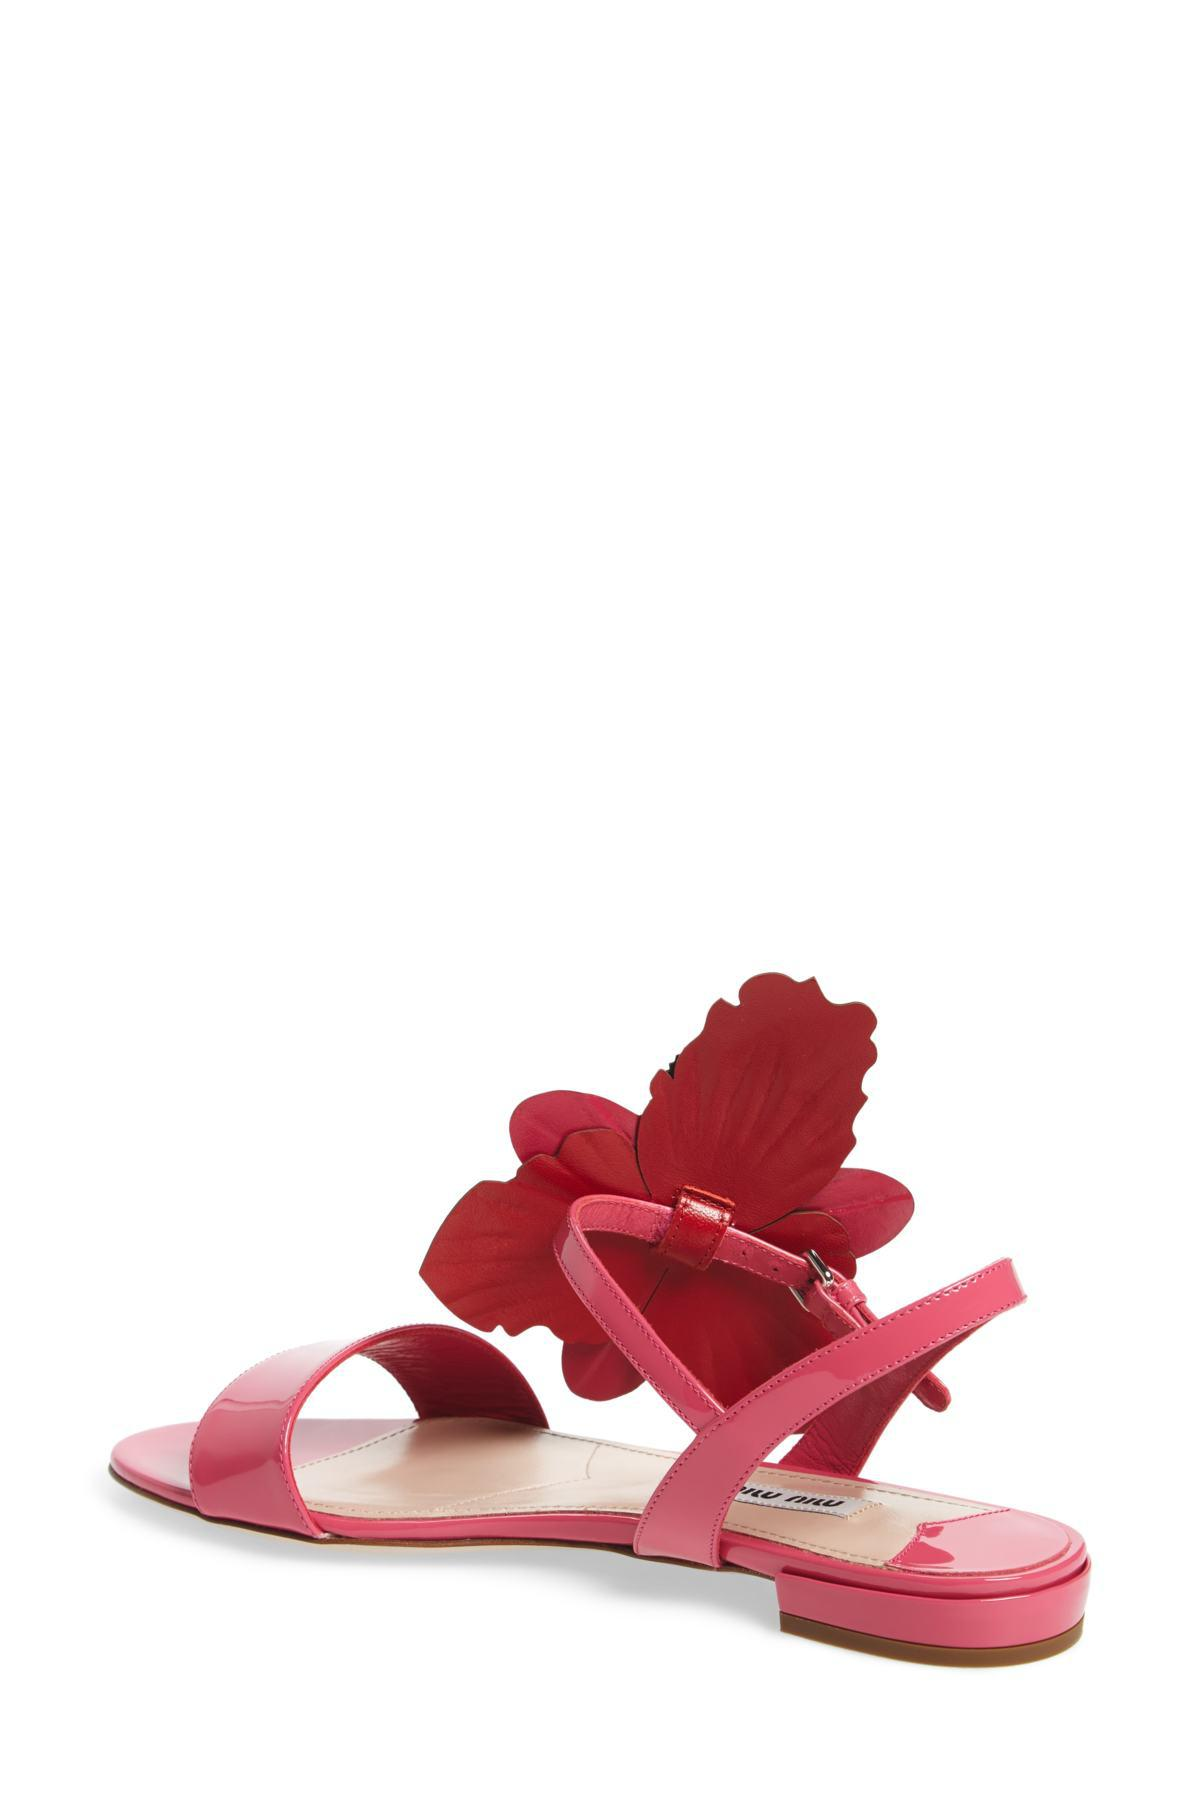 0942c1d5e http   resend.chaosrepublic.com spotty-gntnh 17-sloffen 01 Ballerina ...